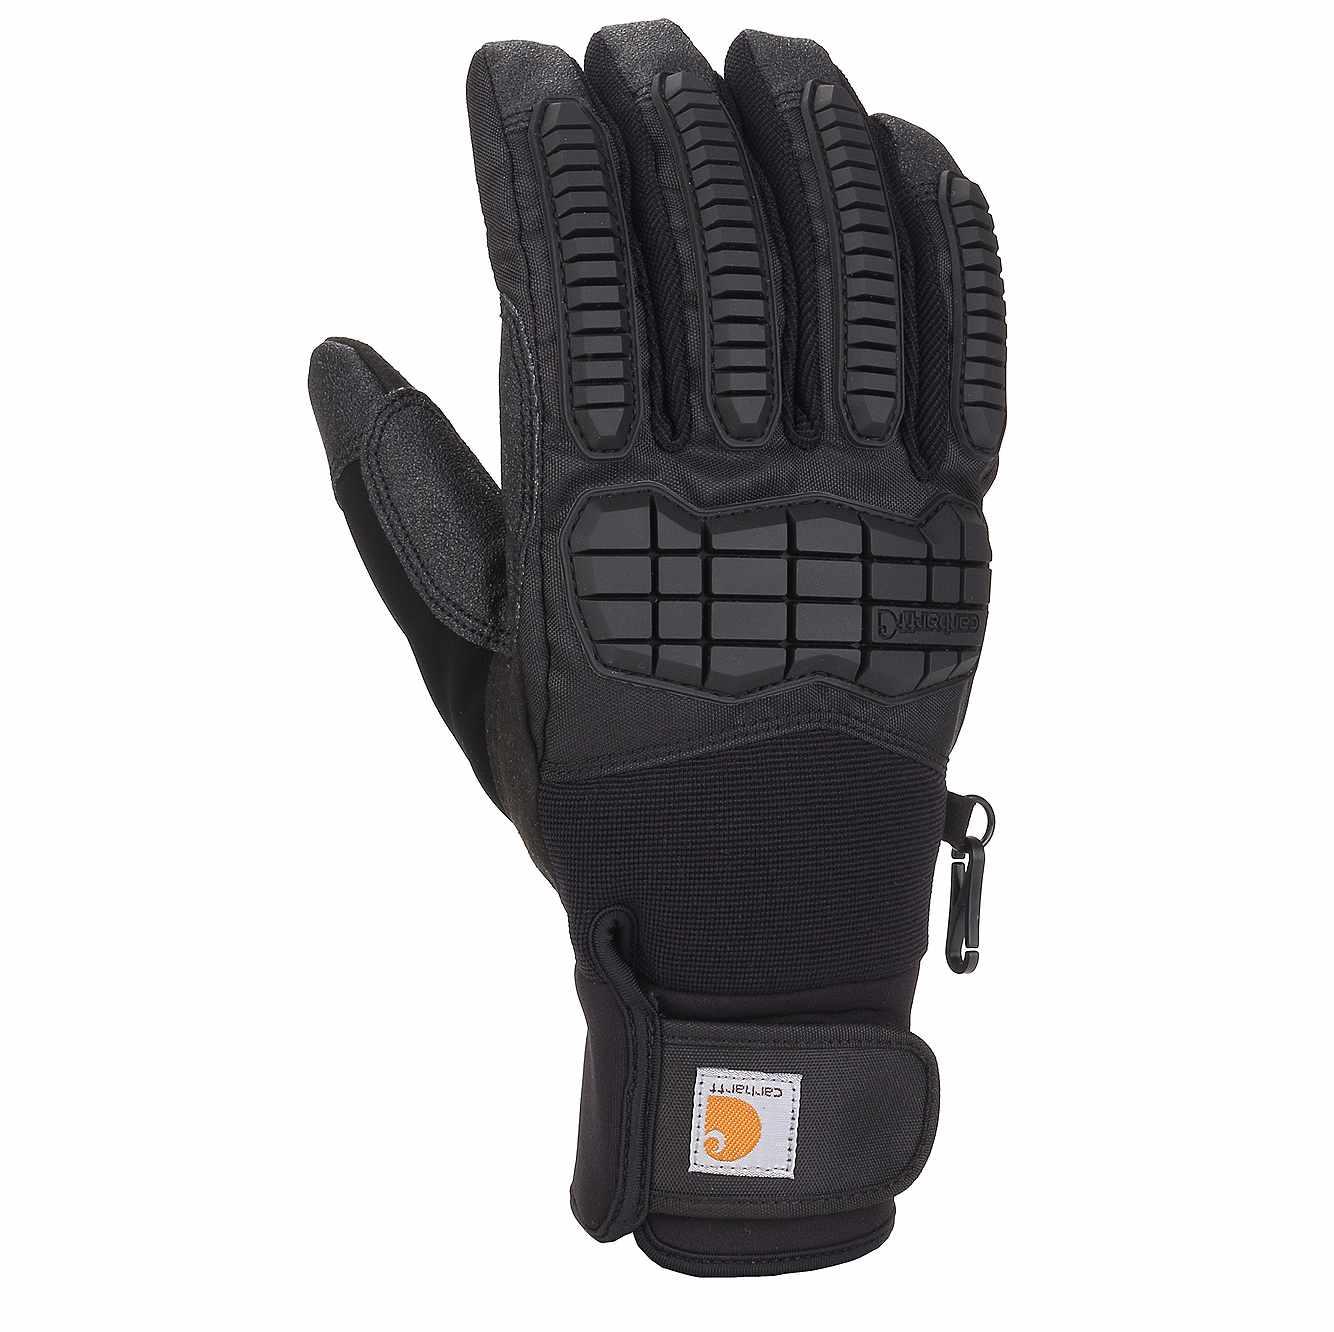 Picture of Winter Ballistic Insulated Glove in Black